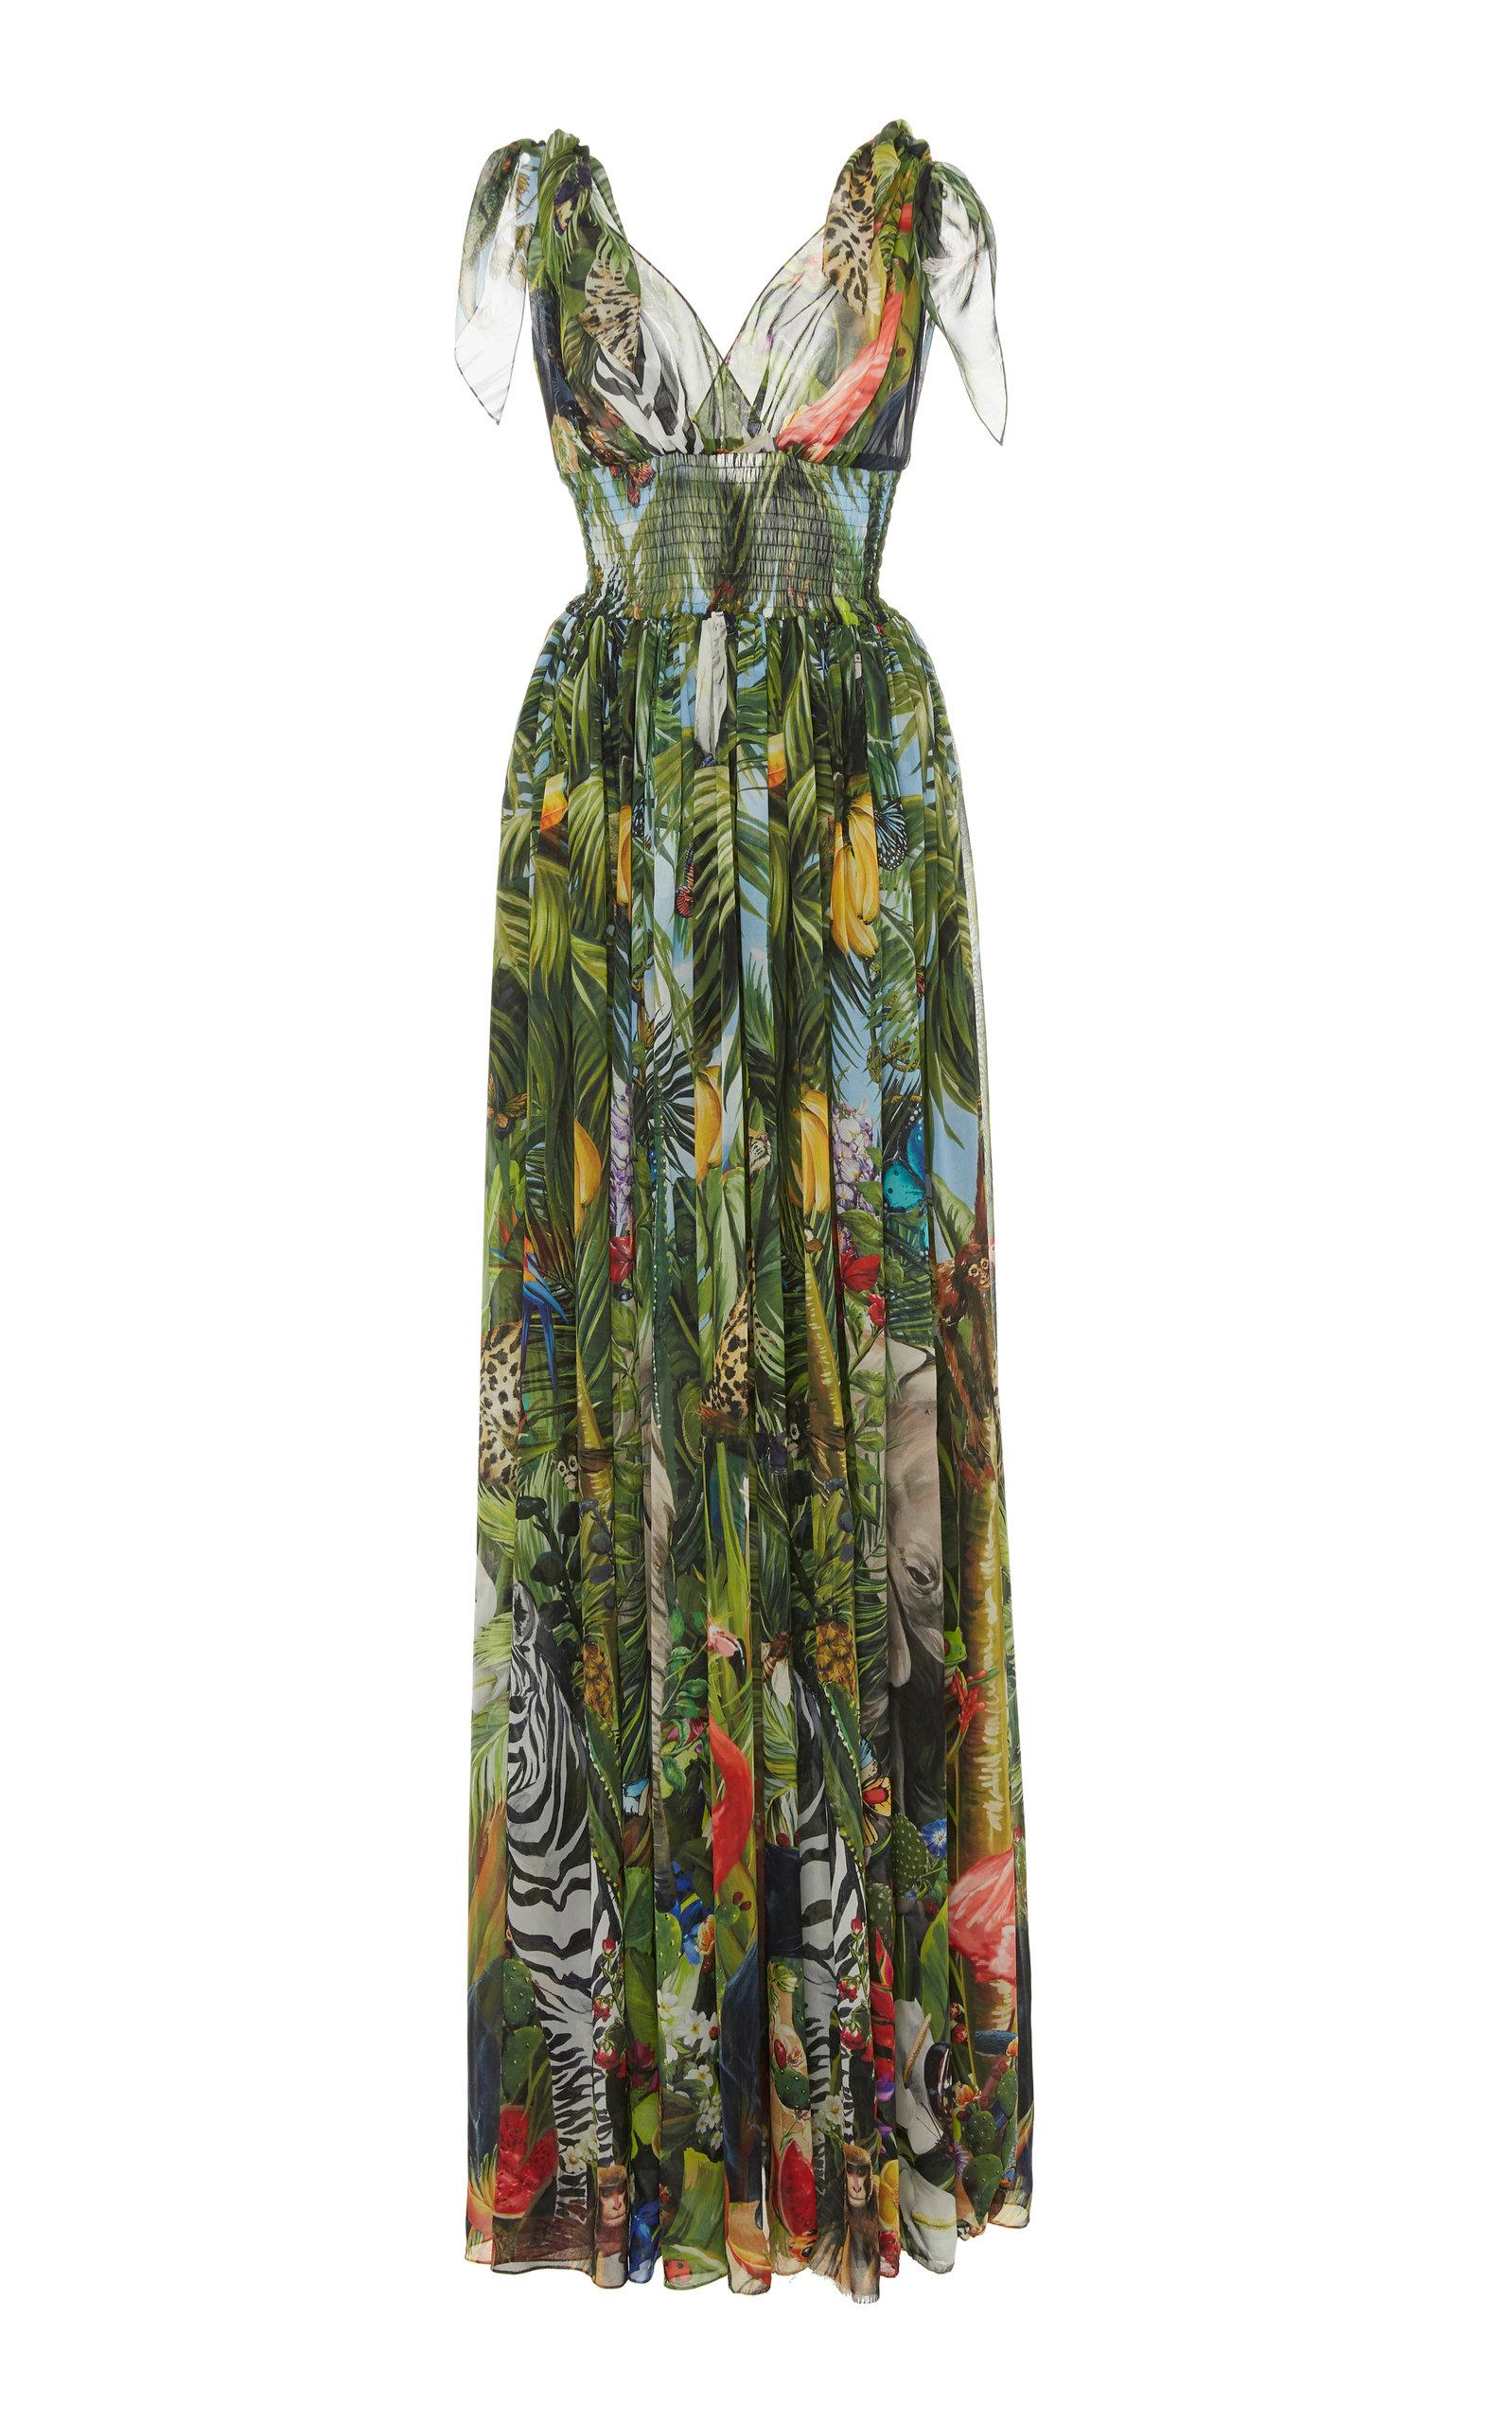 Buy Dolce & Gabbana Smocked Printed Silk-Chiffon Maxi Dress online, shop Dolce & Gabbana at the best price